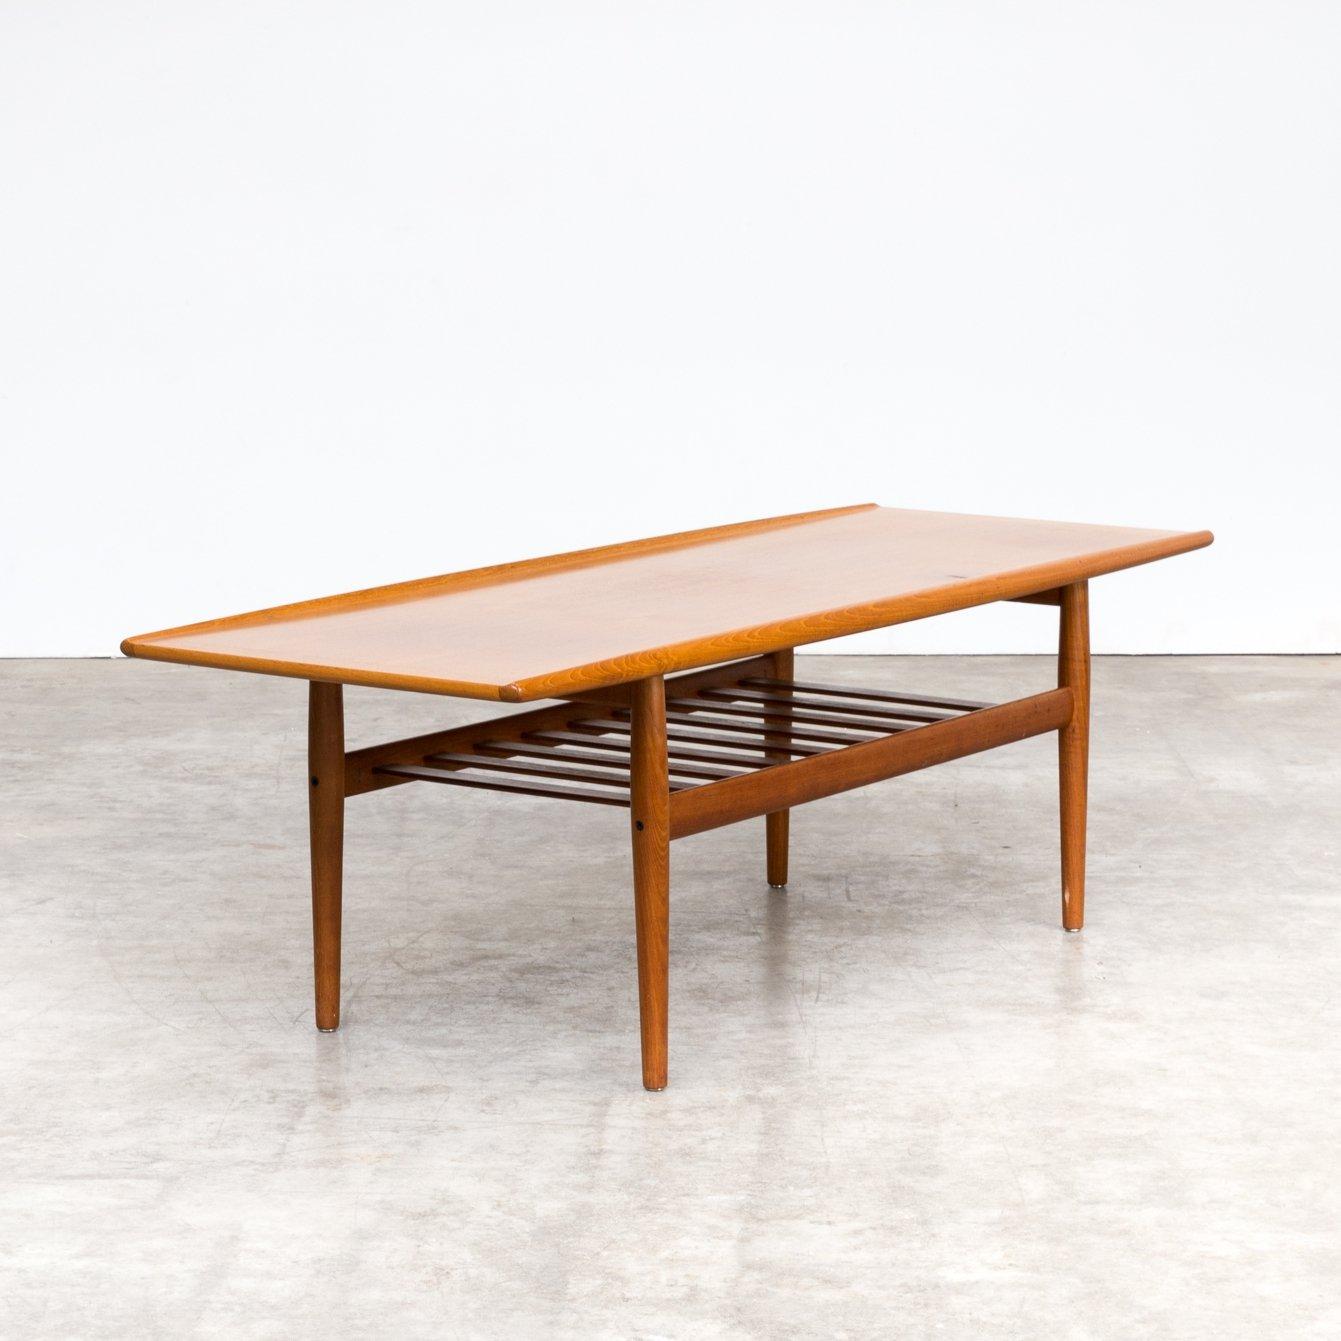 https www vntg com 99697 50s grete jalk coffee table in teak by glostrup m c3 b8belfabrik